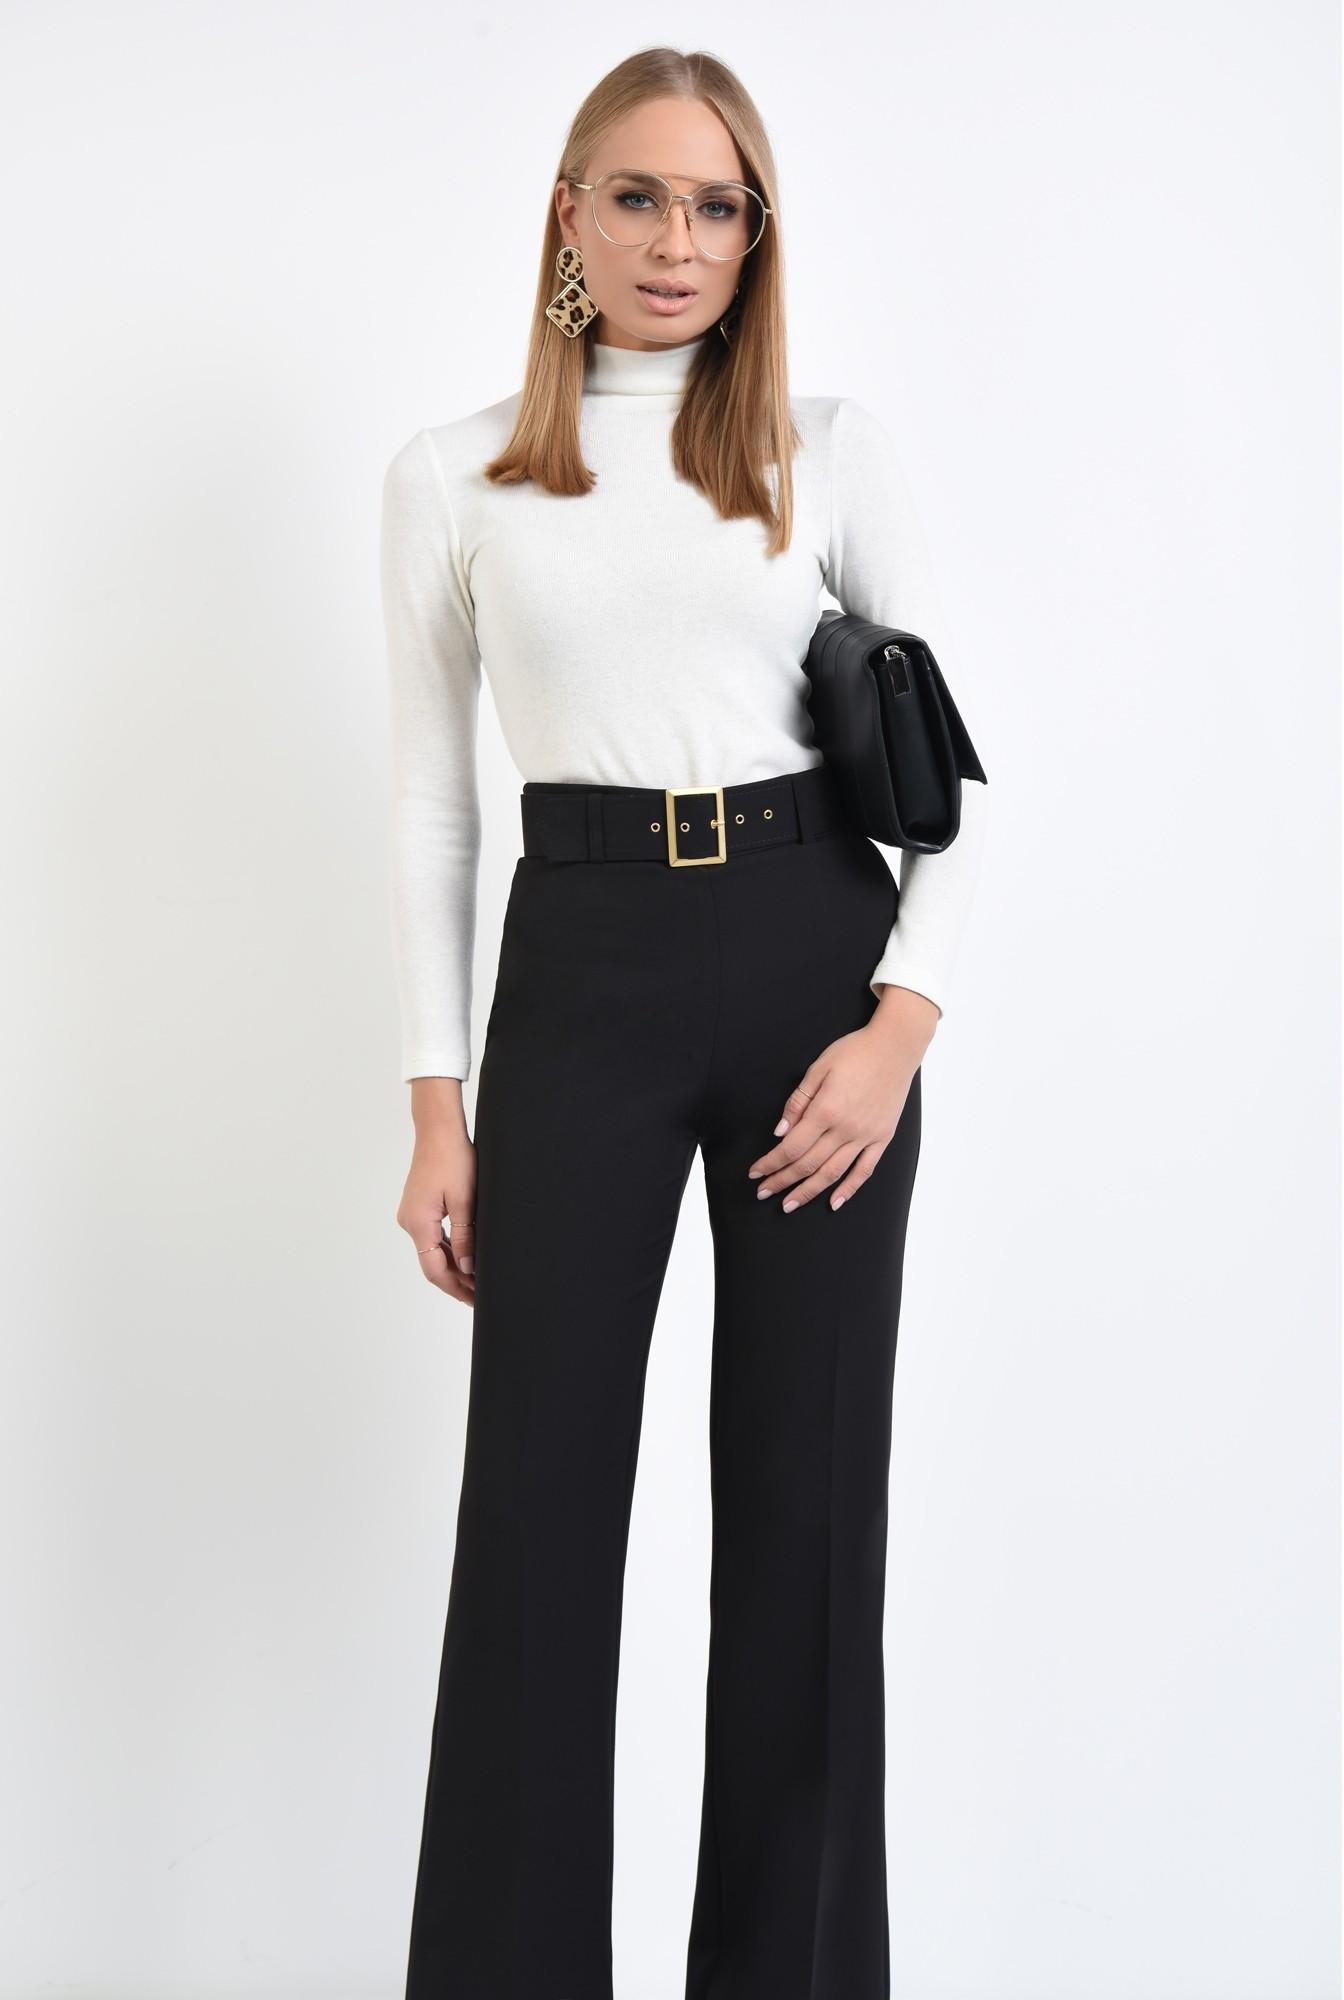 0 - pantaloni de ocazie, centura din material textil, pantaloni online